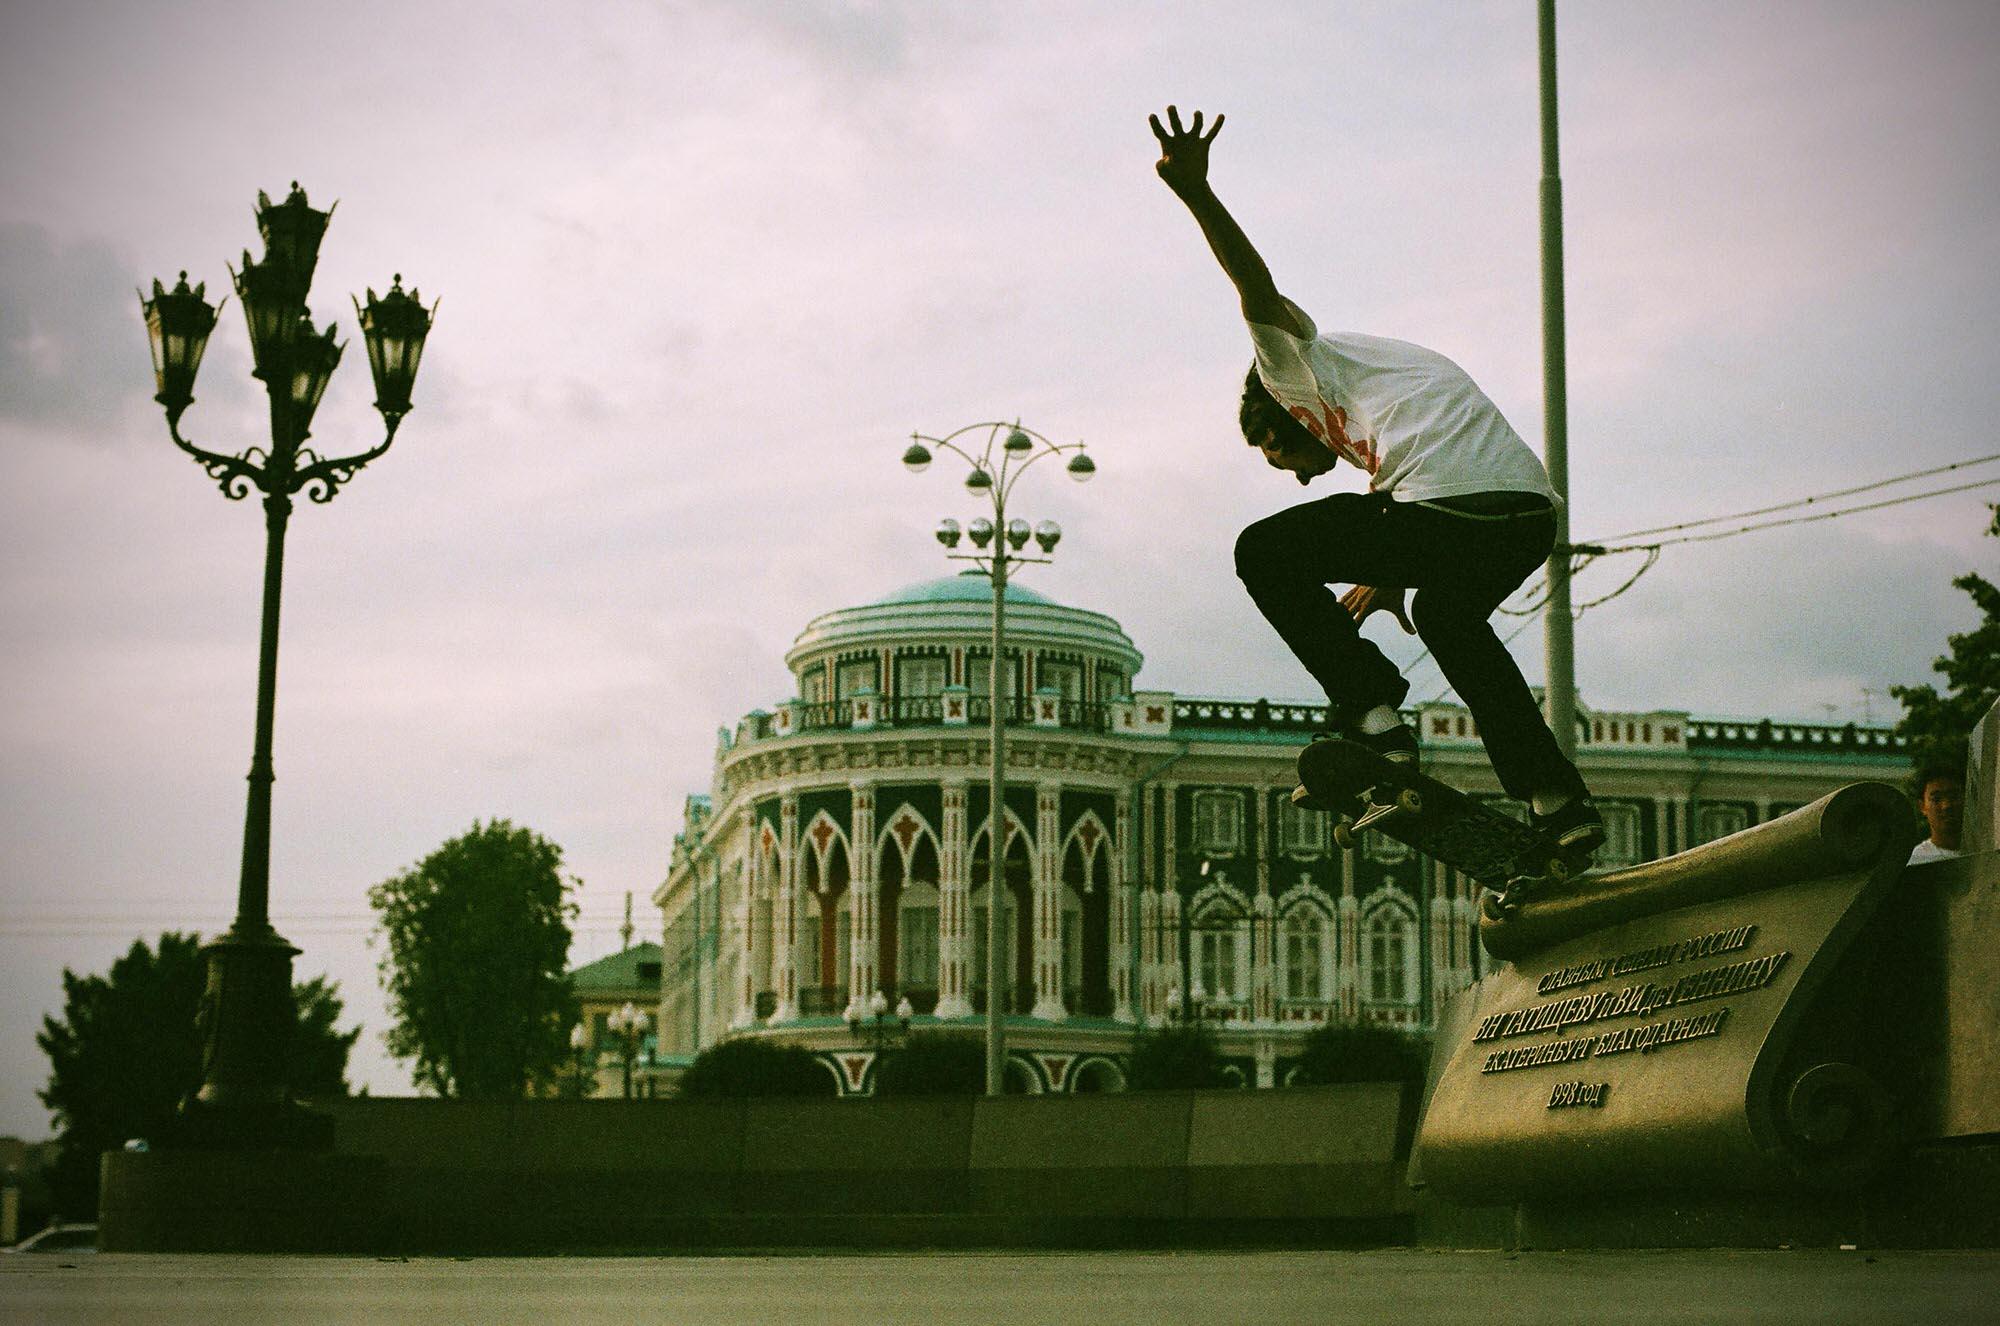 35mmPatrikWallner_Yekaterinburg_JohnCrookedScrollLOWQ